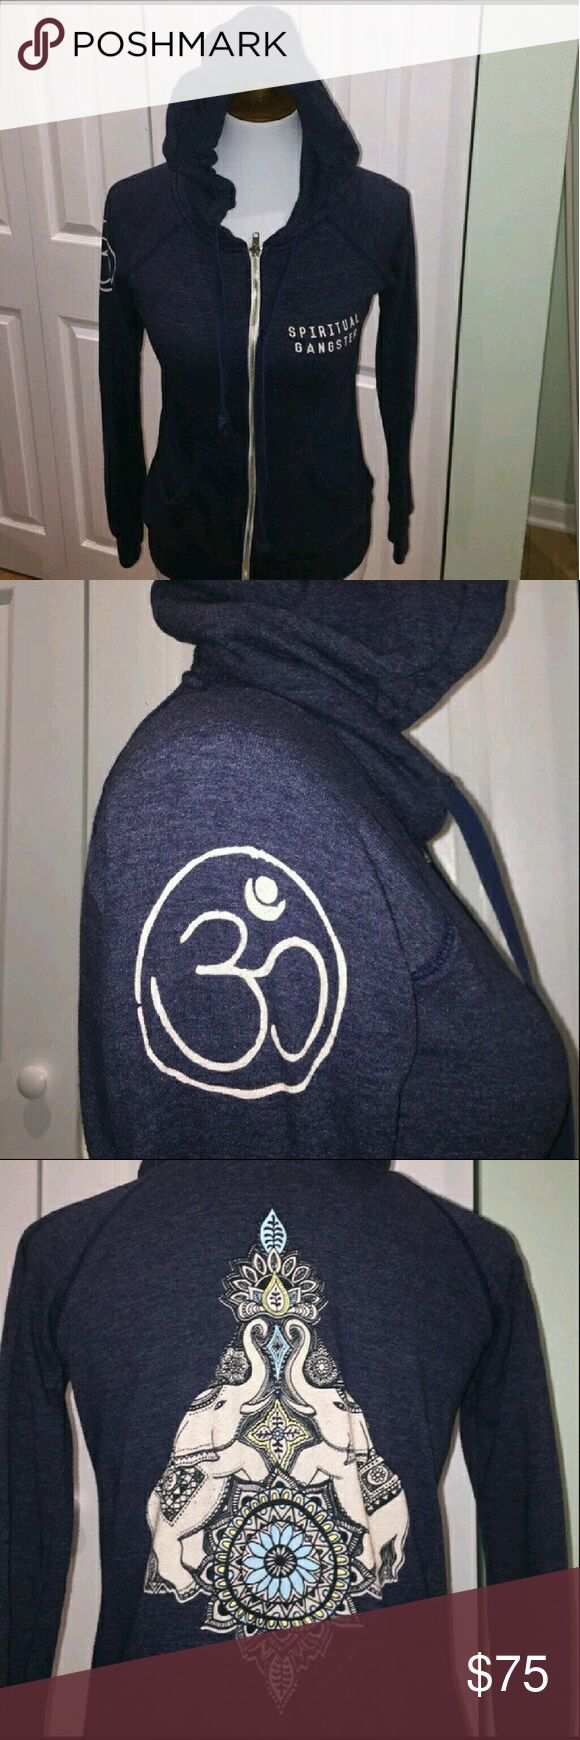 Spiritual gangster zip up Spiritual gangater hoodie. EUC worn one time, washed and dryed flat. spiritual gangster Tops Sweatshirts & Hoodies